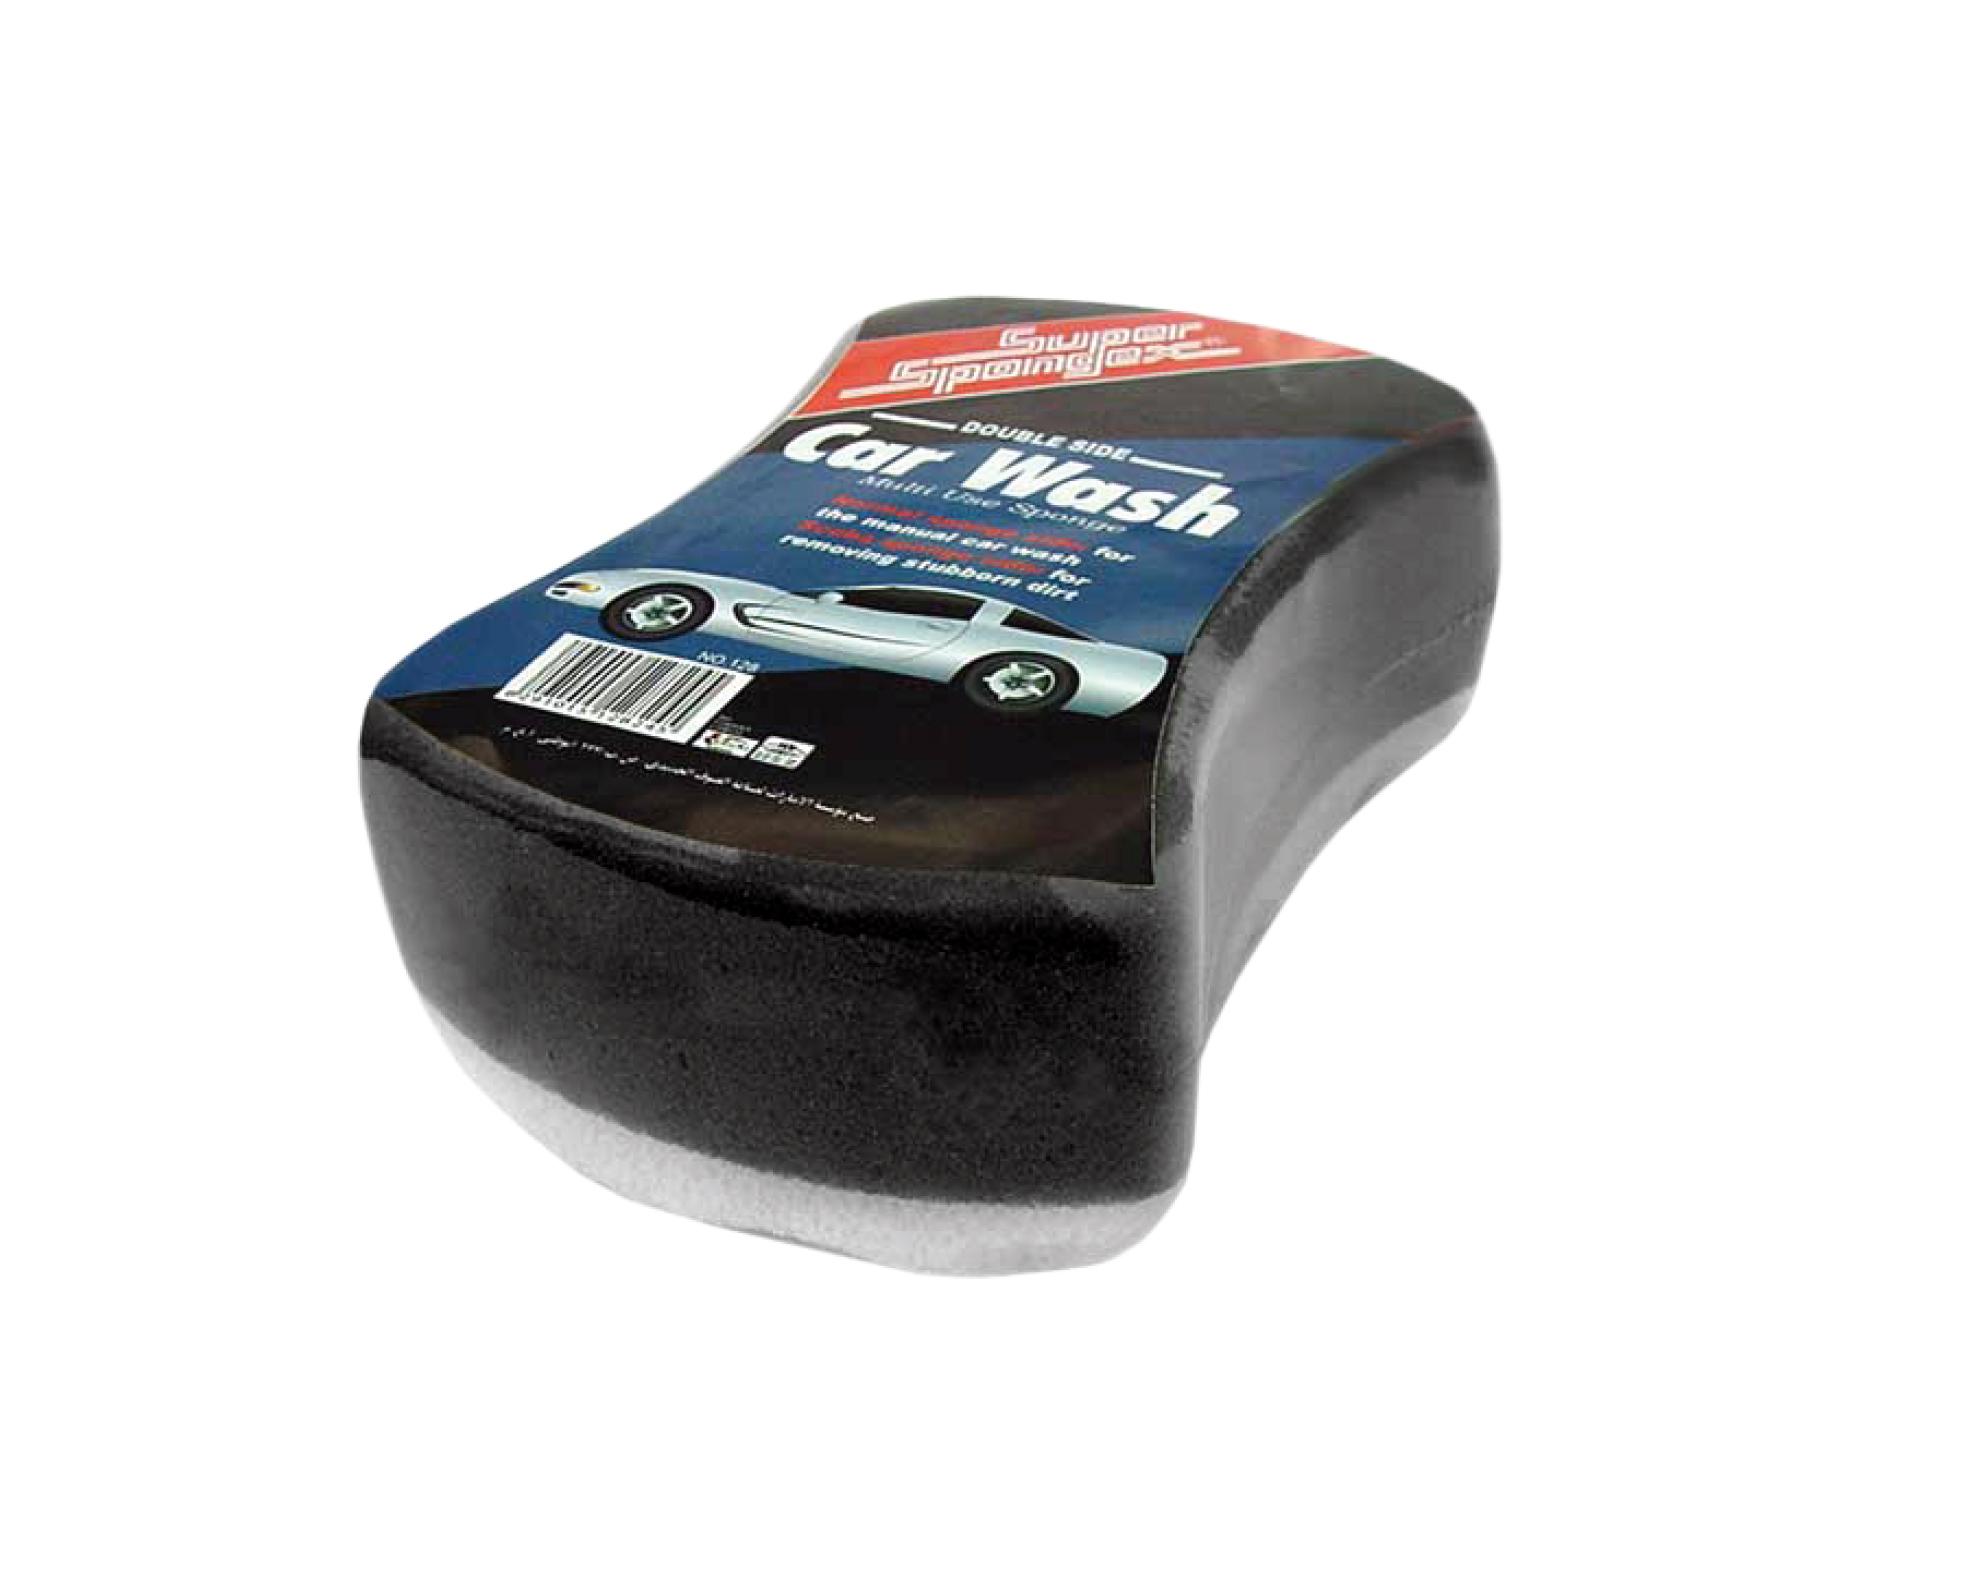 Double Sided Car Wash - -multi-purpose& easy-grip car wash sponge